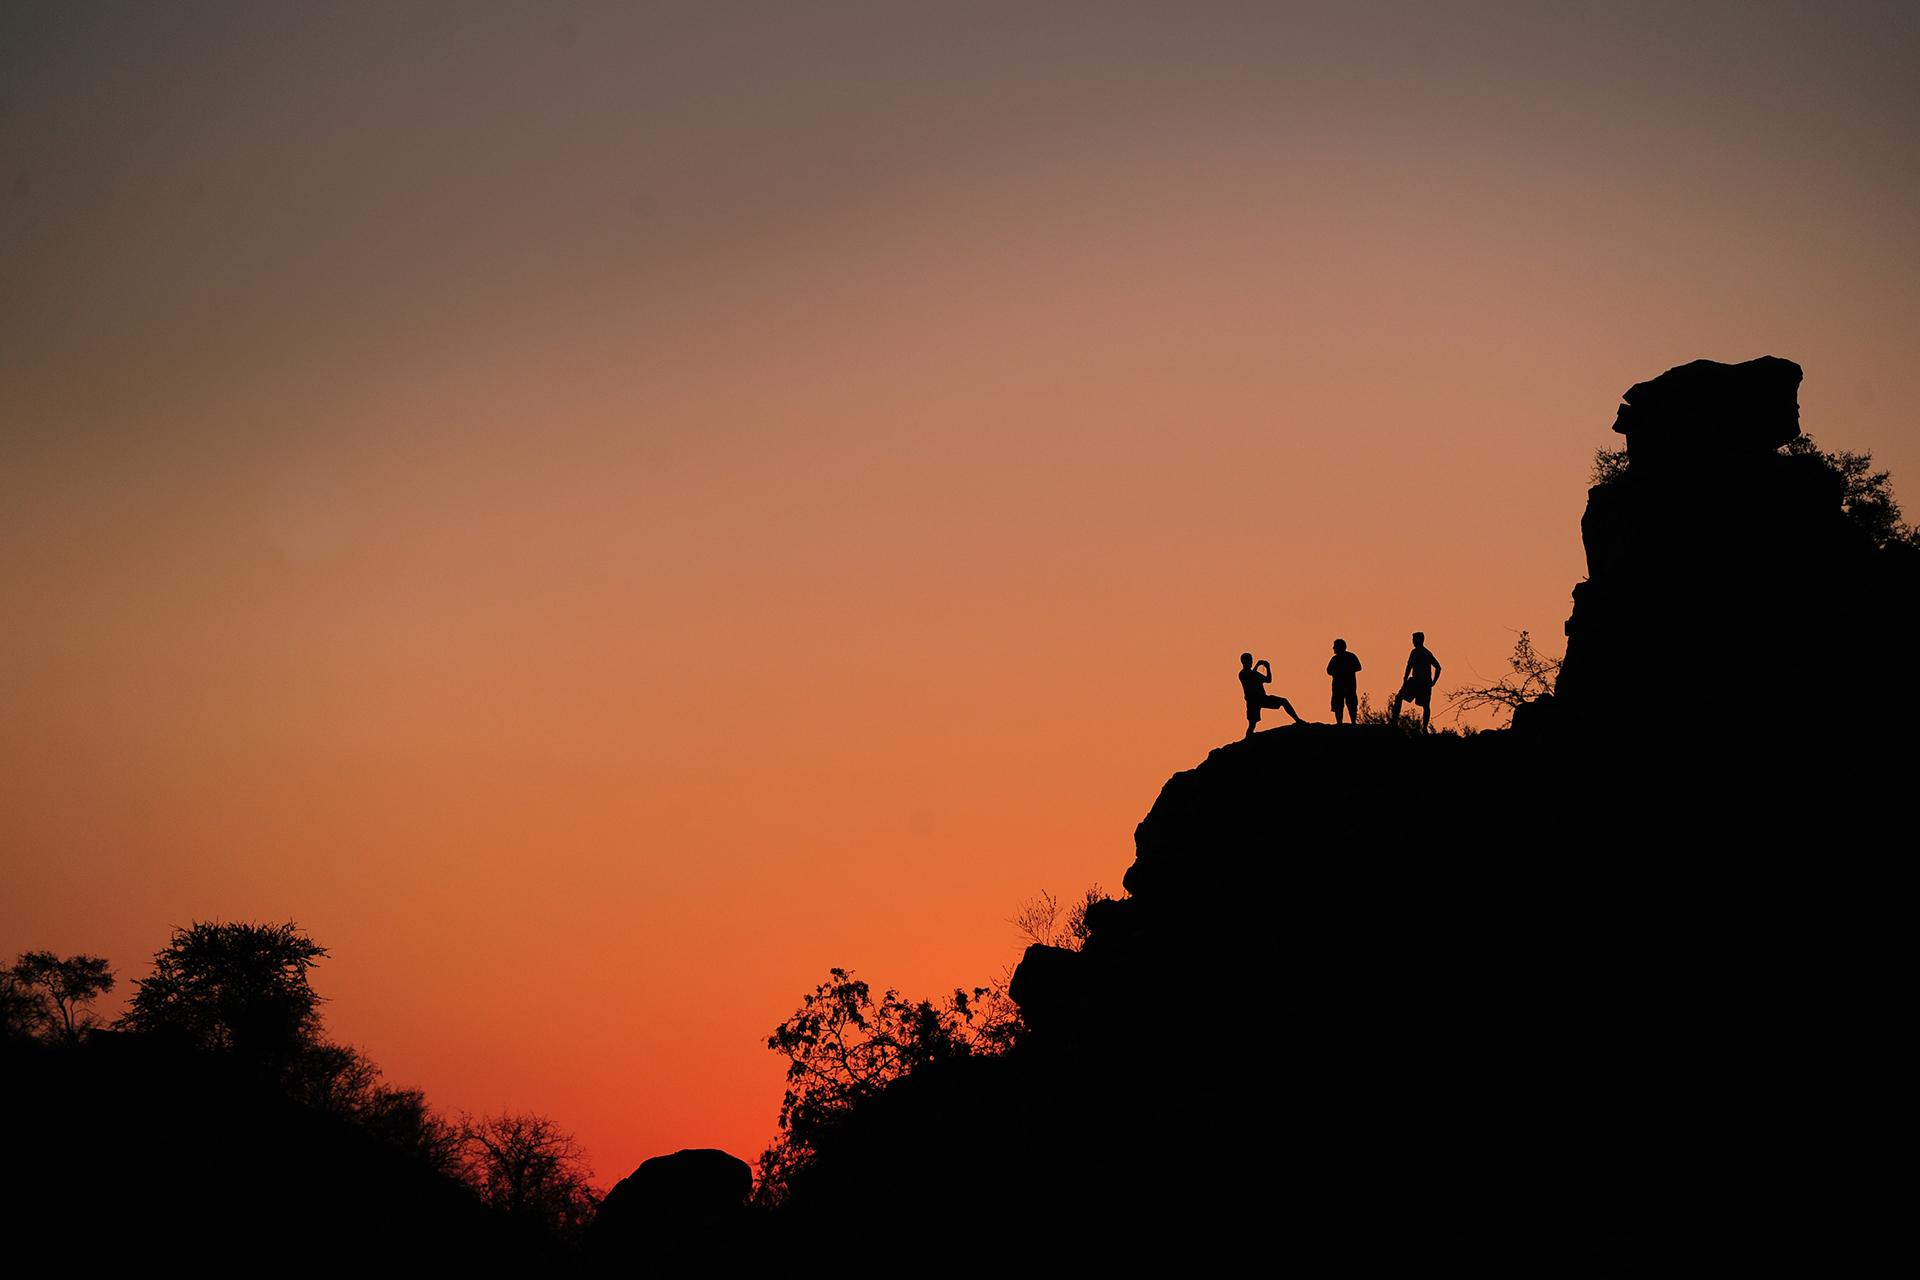 VAUDE-Visions-Wallpapers-for-free-Kelvin-Trautman-Botswana-Africa-Tuli-Block-wallpaper-wp48011709